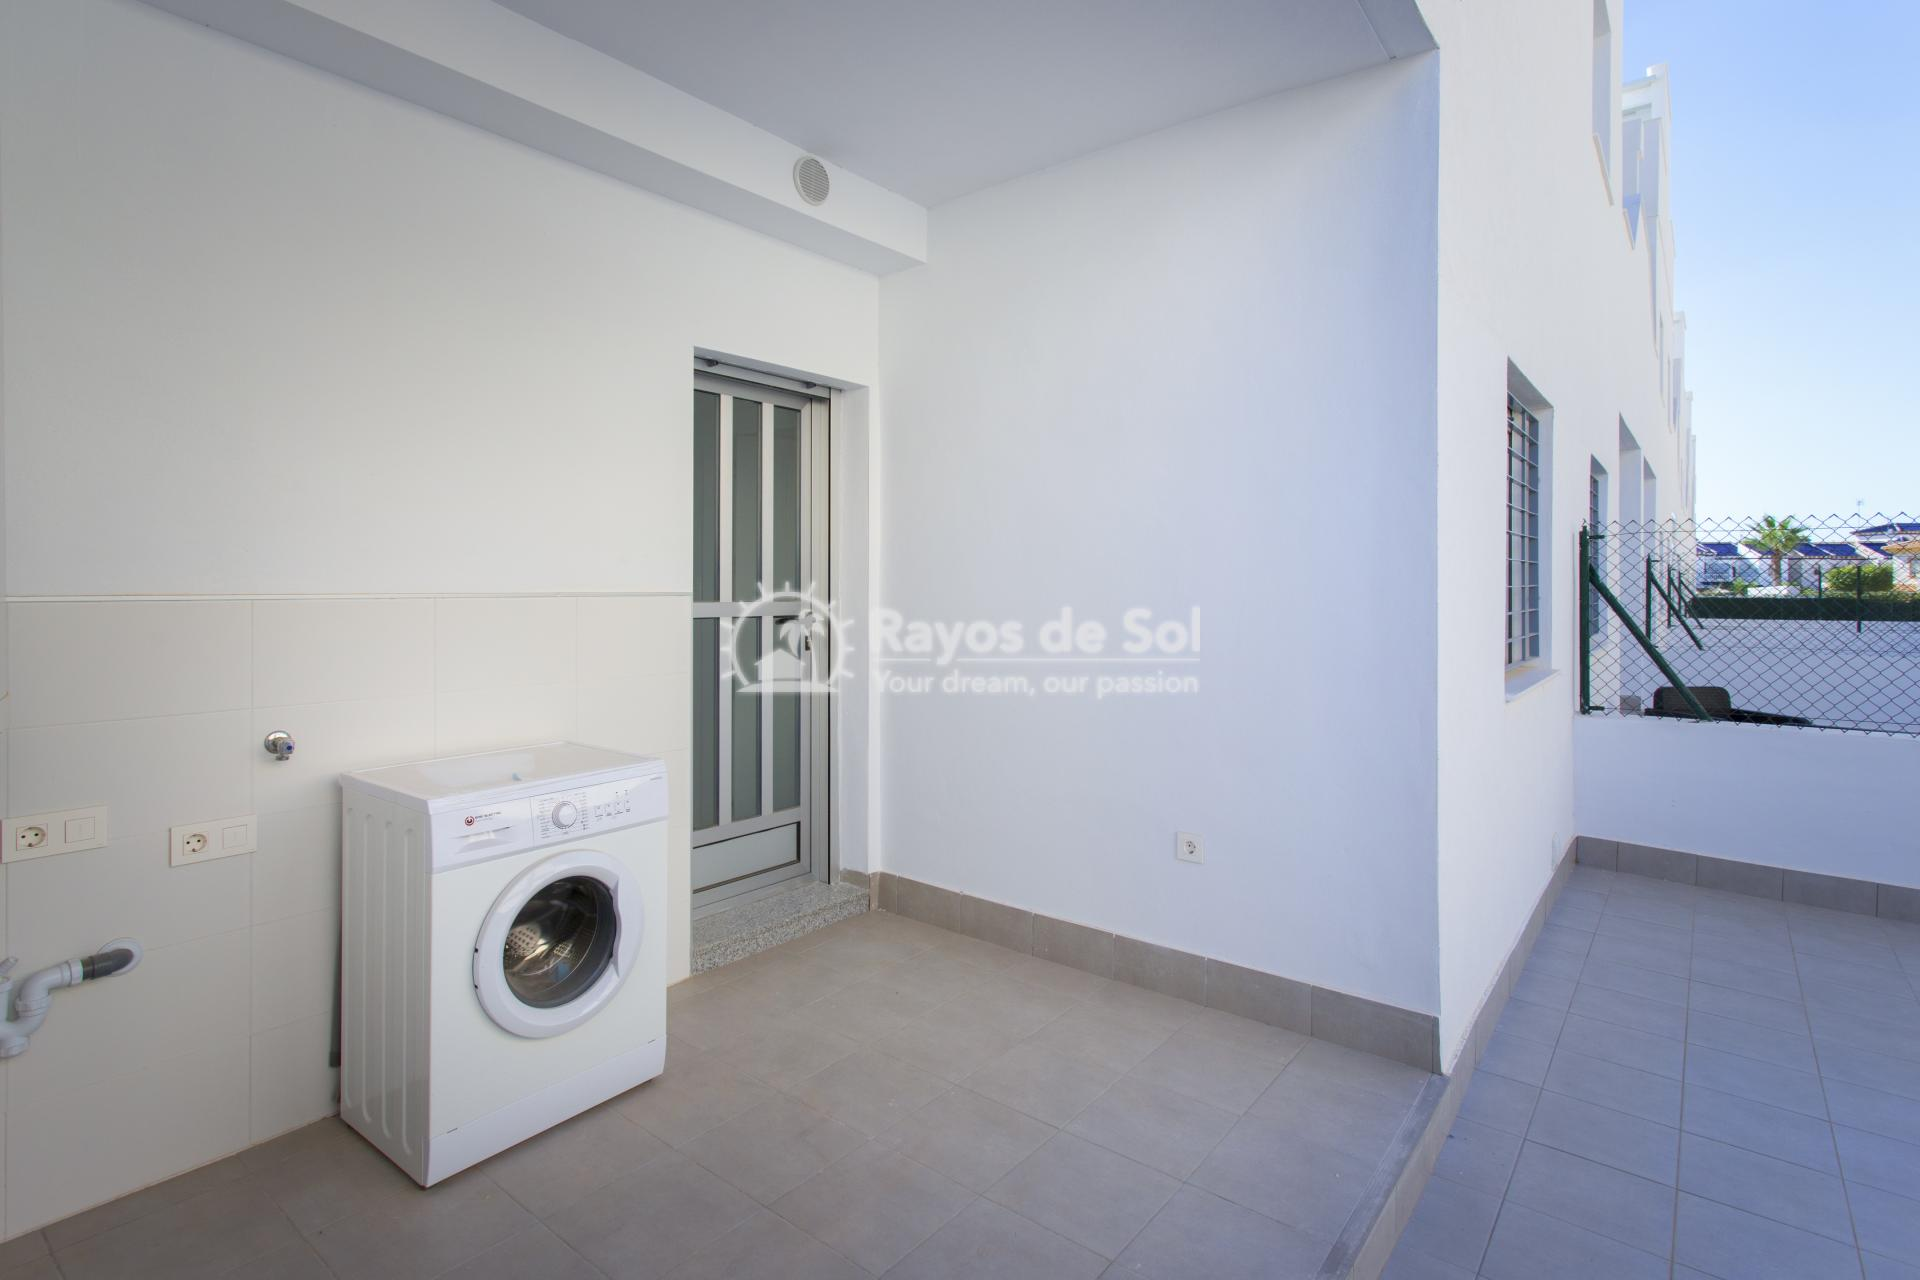 Appartement begane grond  in La Florida, Orihuela Costa, Costa Blanca (Oasis place BG3-2) - 22